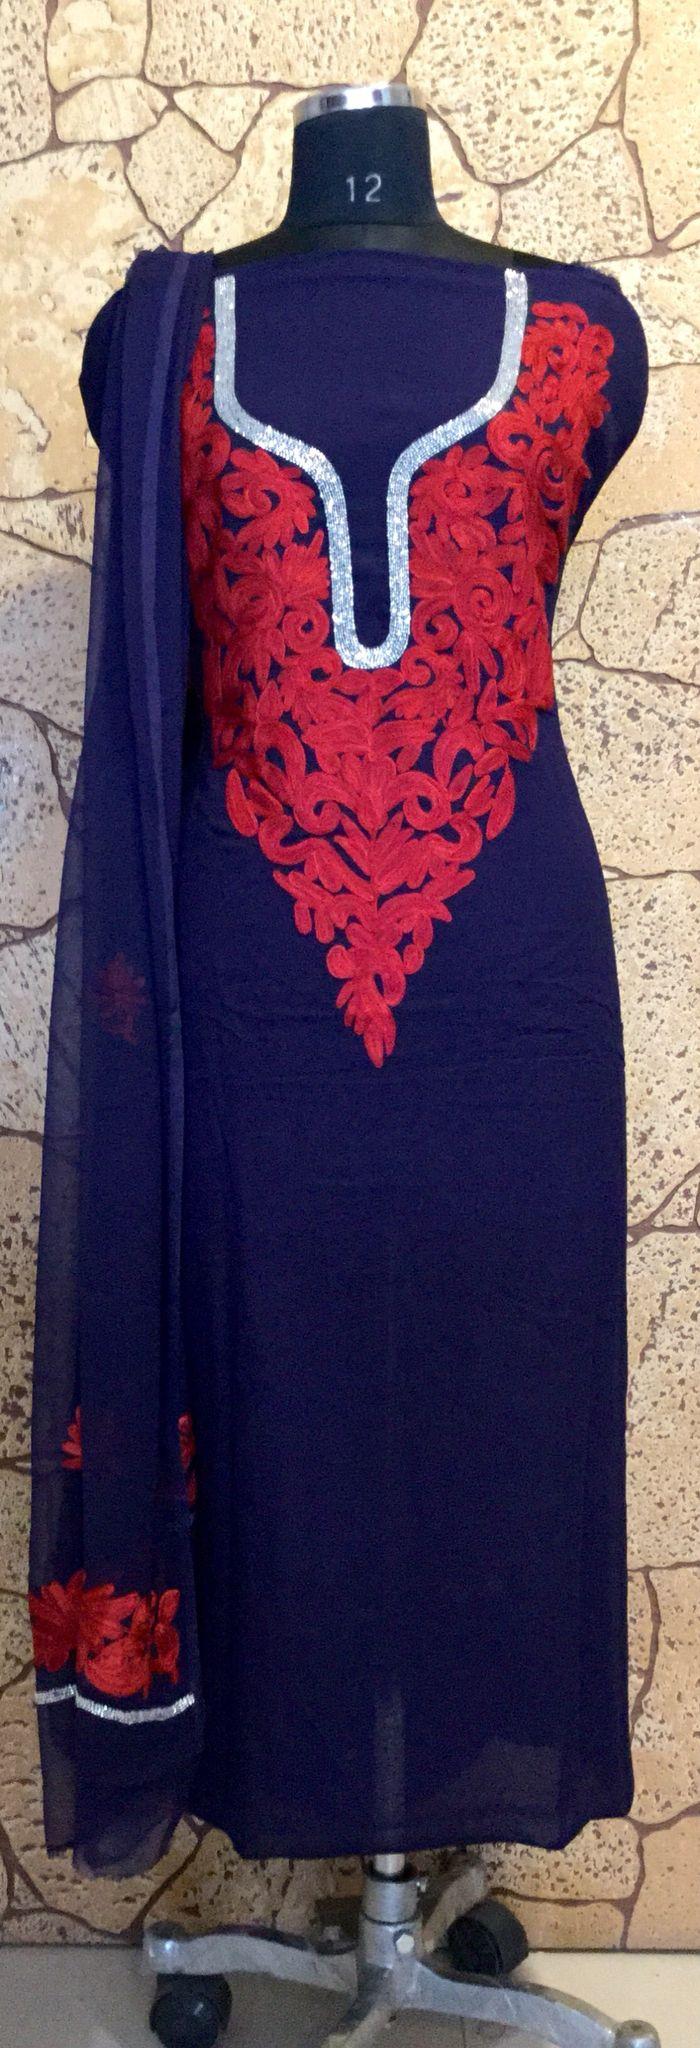 Navy blue Kashmiri Suit with red colour embroidery. #Kashmiri #suit #indian #wear #fashionable #embroidered #fashion #india #dress #suit #salwarKameez #designer #women